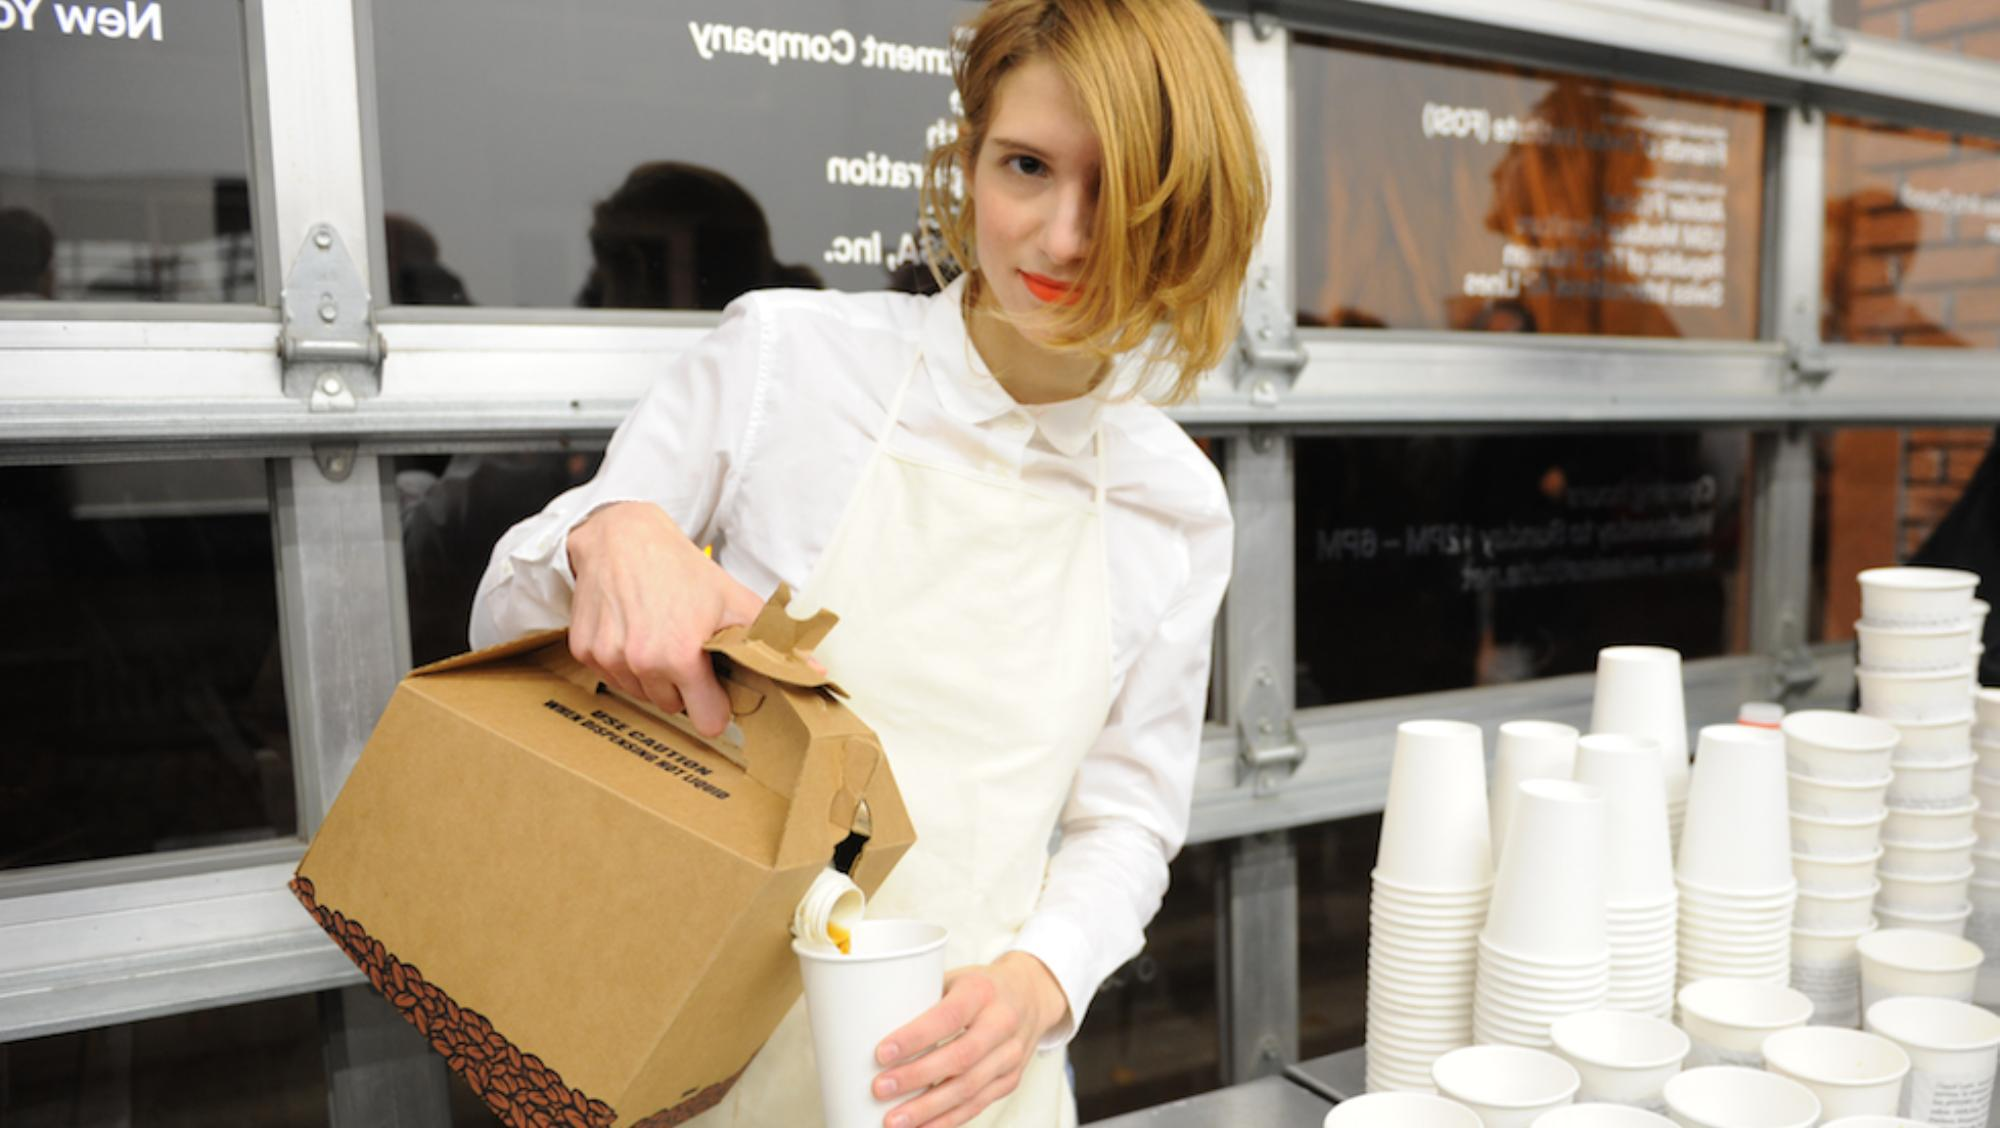 Artist @deanna_havas is leaving New York to brew cosmic lattes in Switzerland: http://t.co/xKm6fJjajA http://t.co/g1hD476EgQ